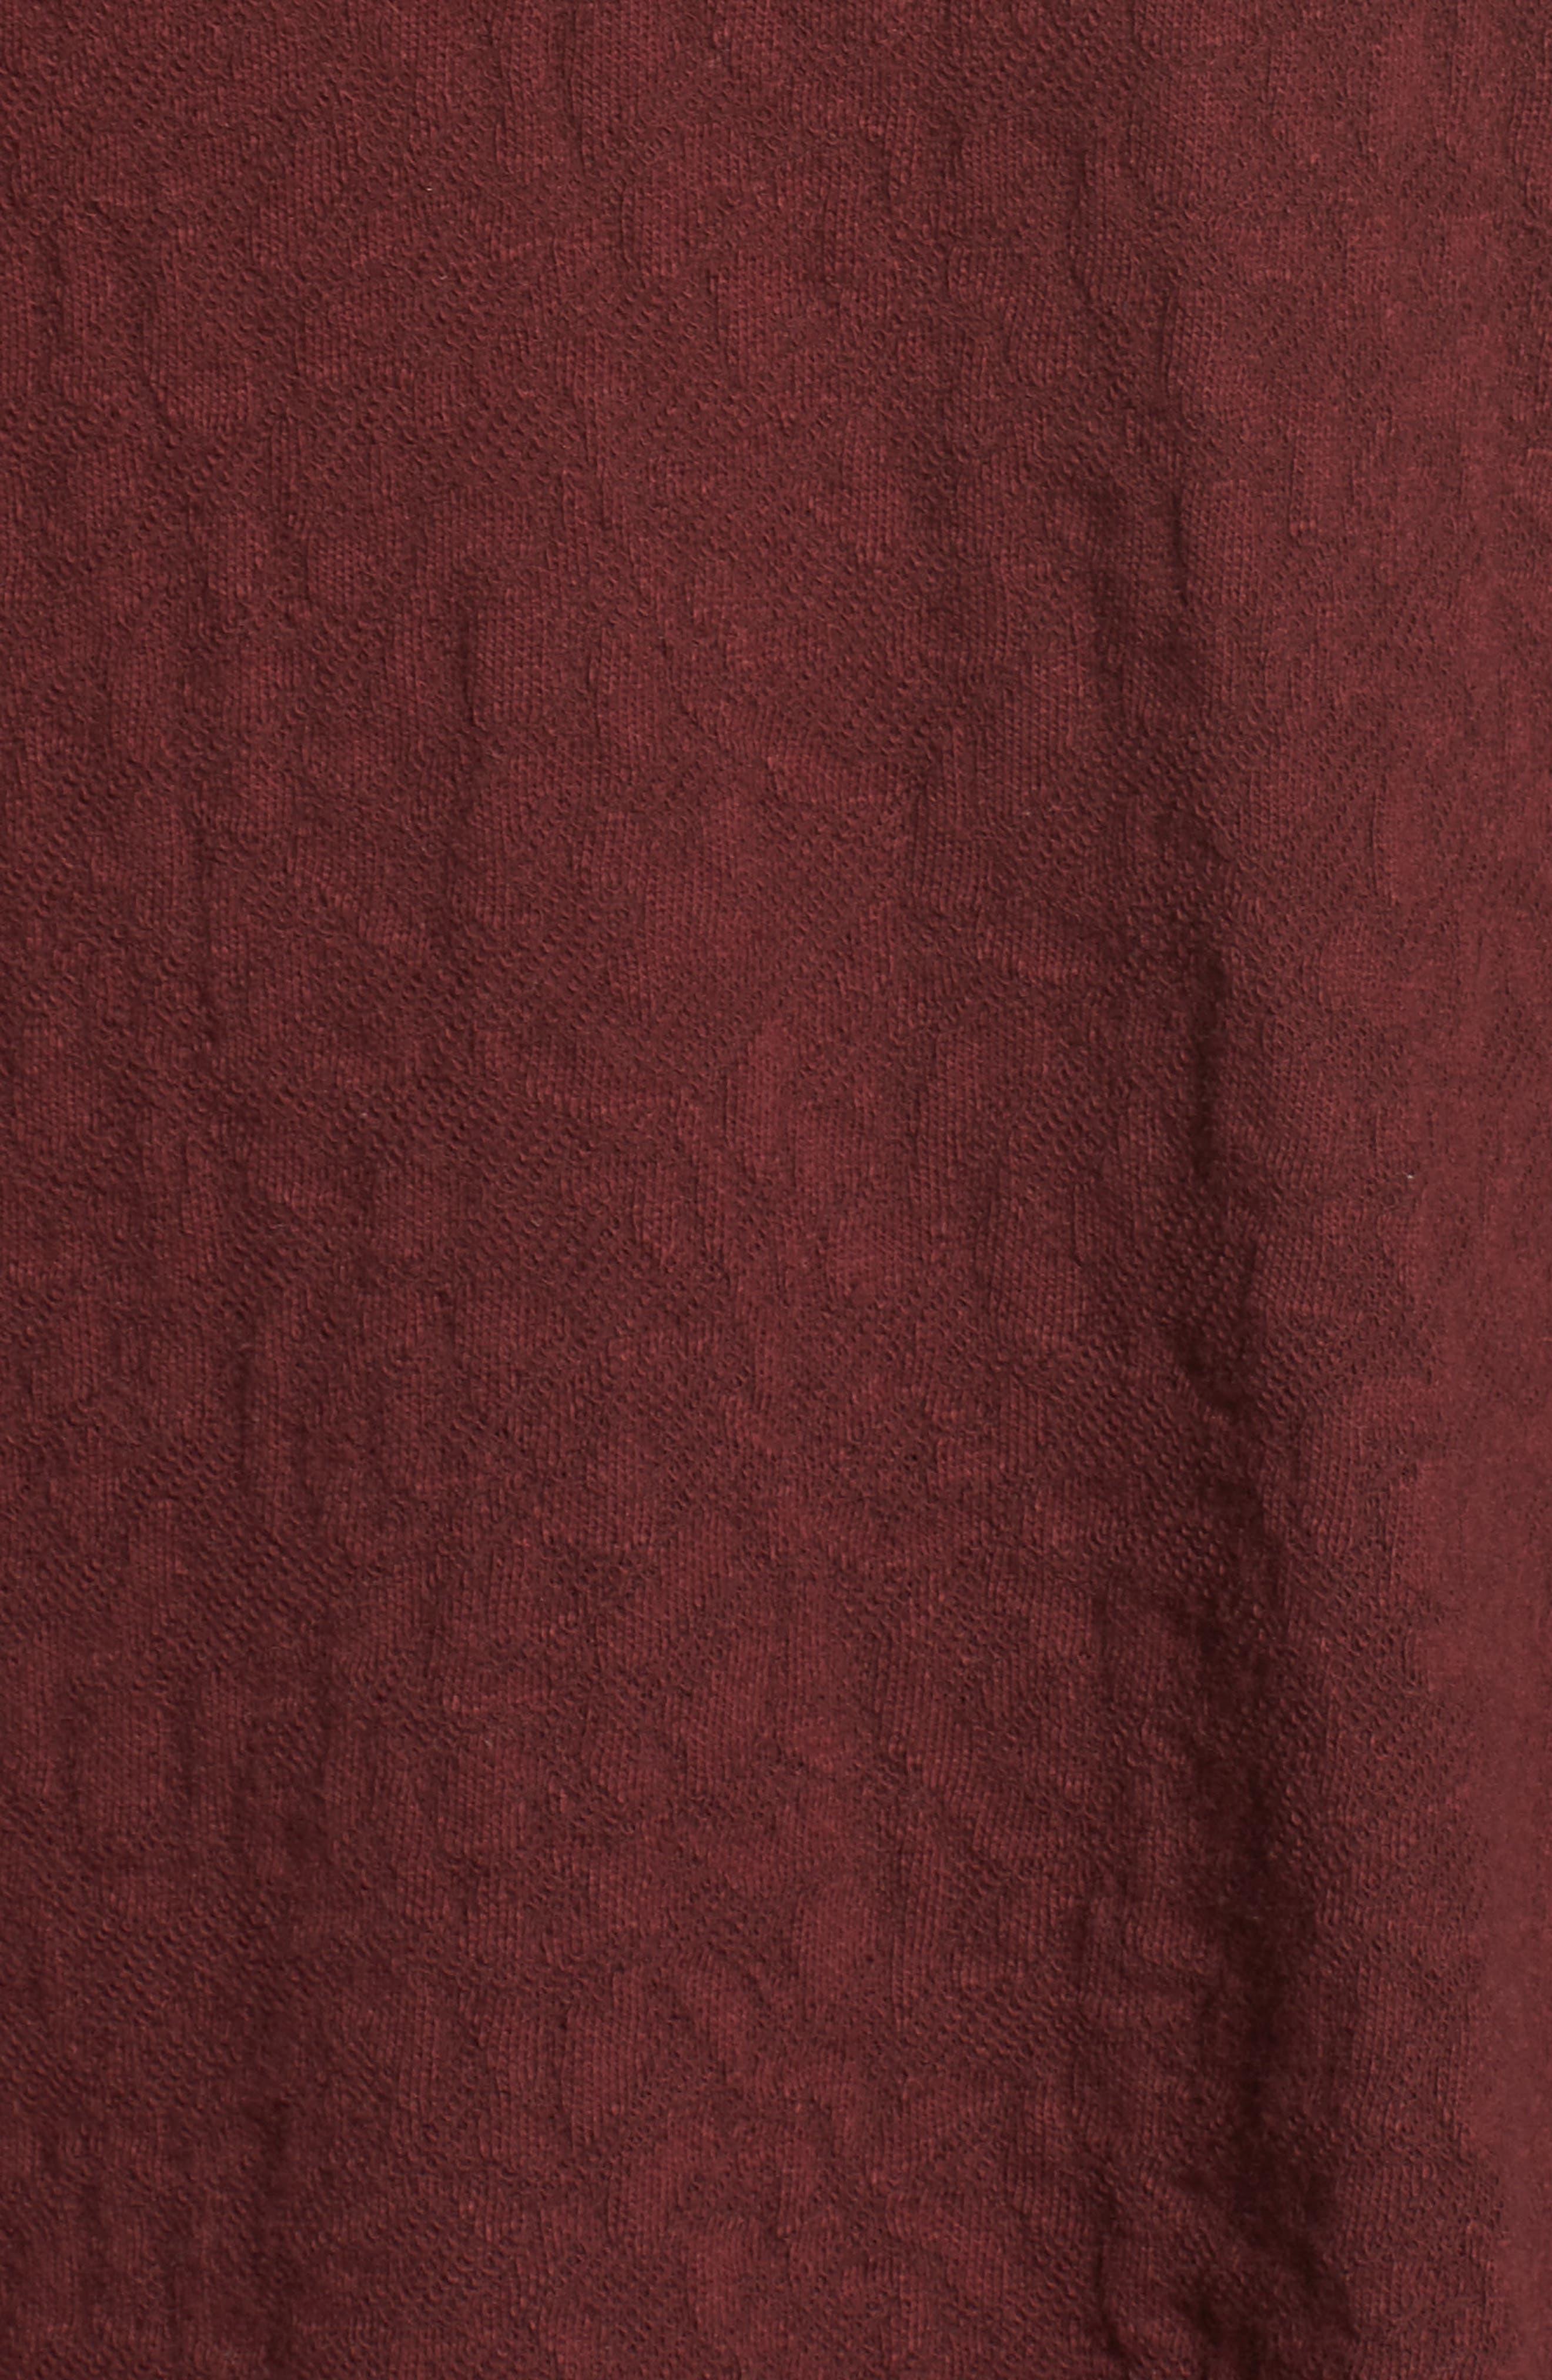 Lace Knit Top,                             Alternate thumbnail 5, color,